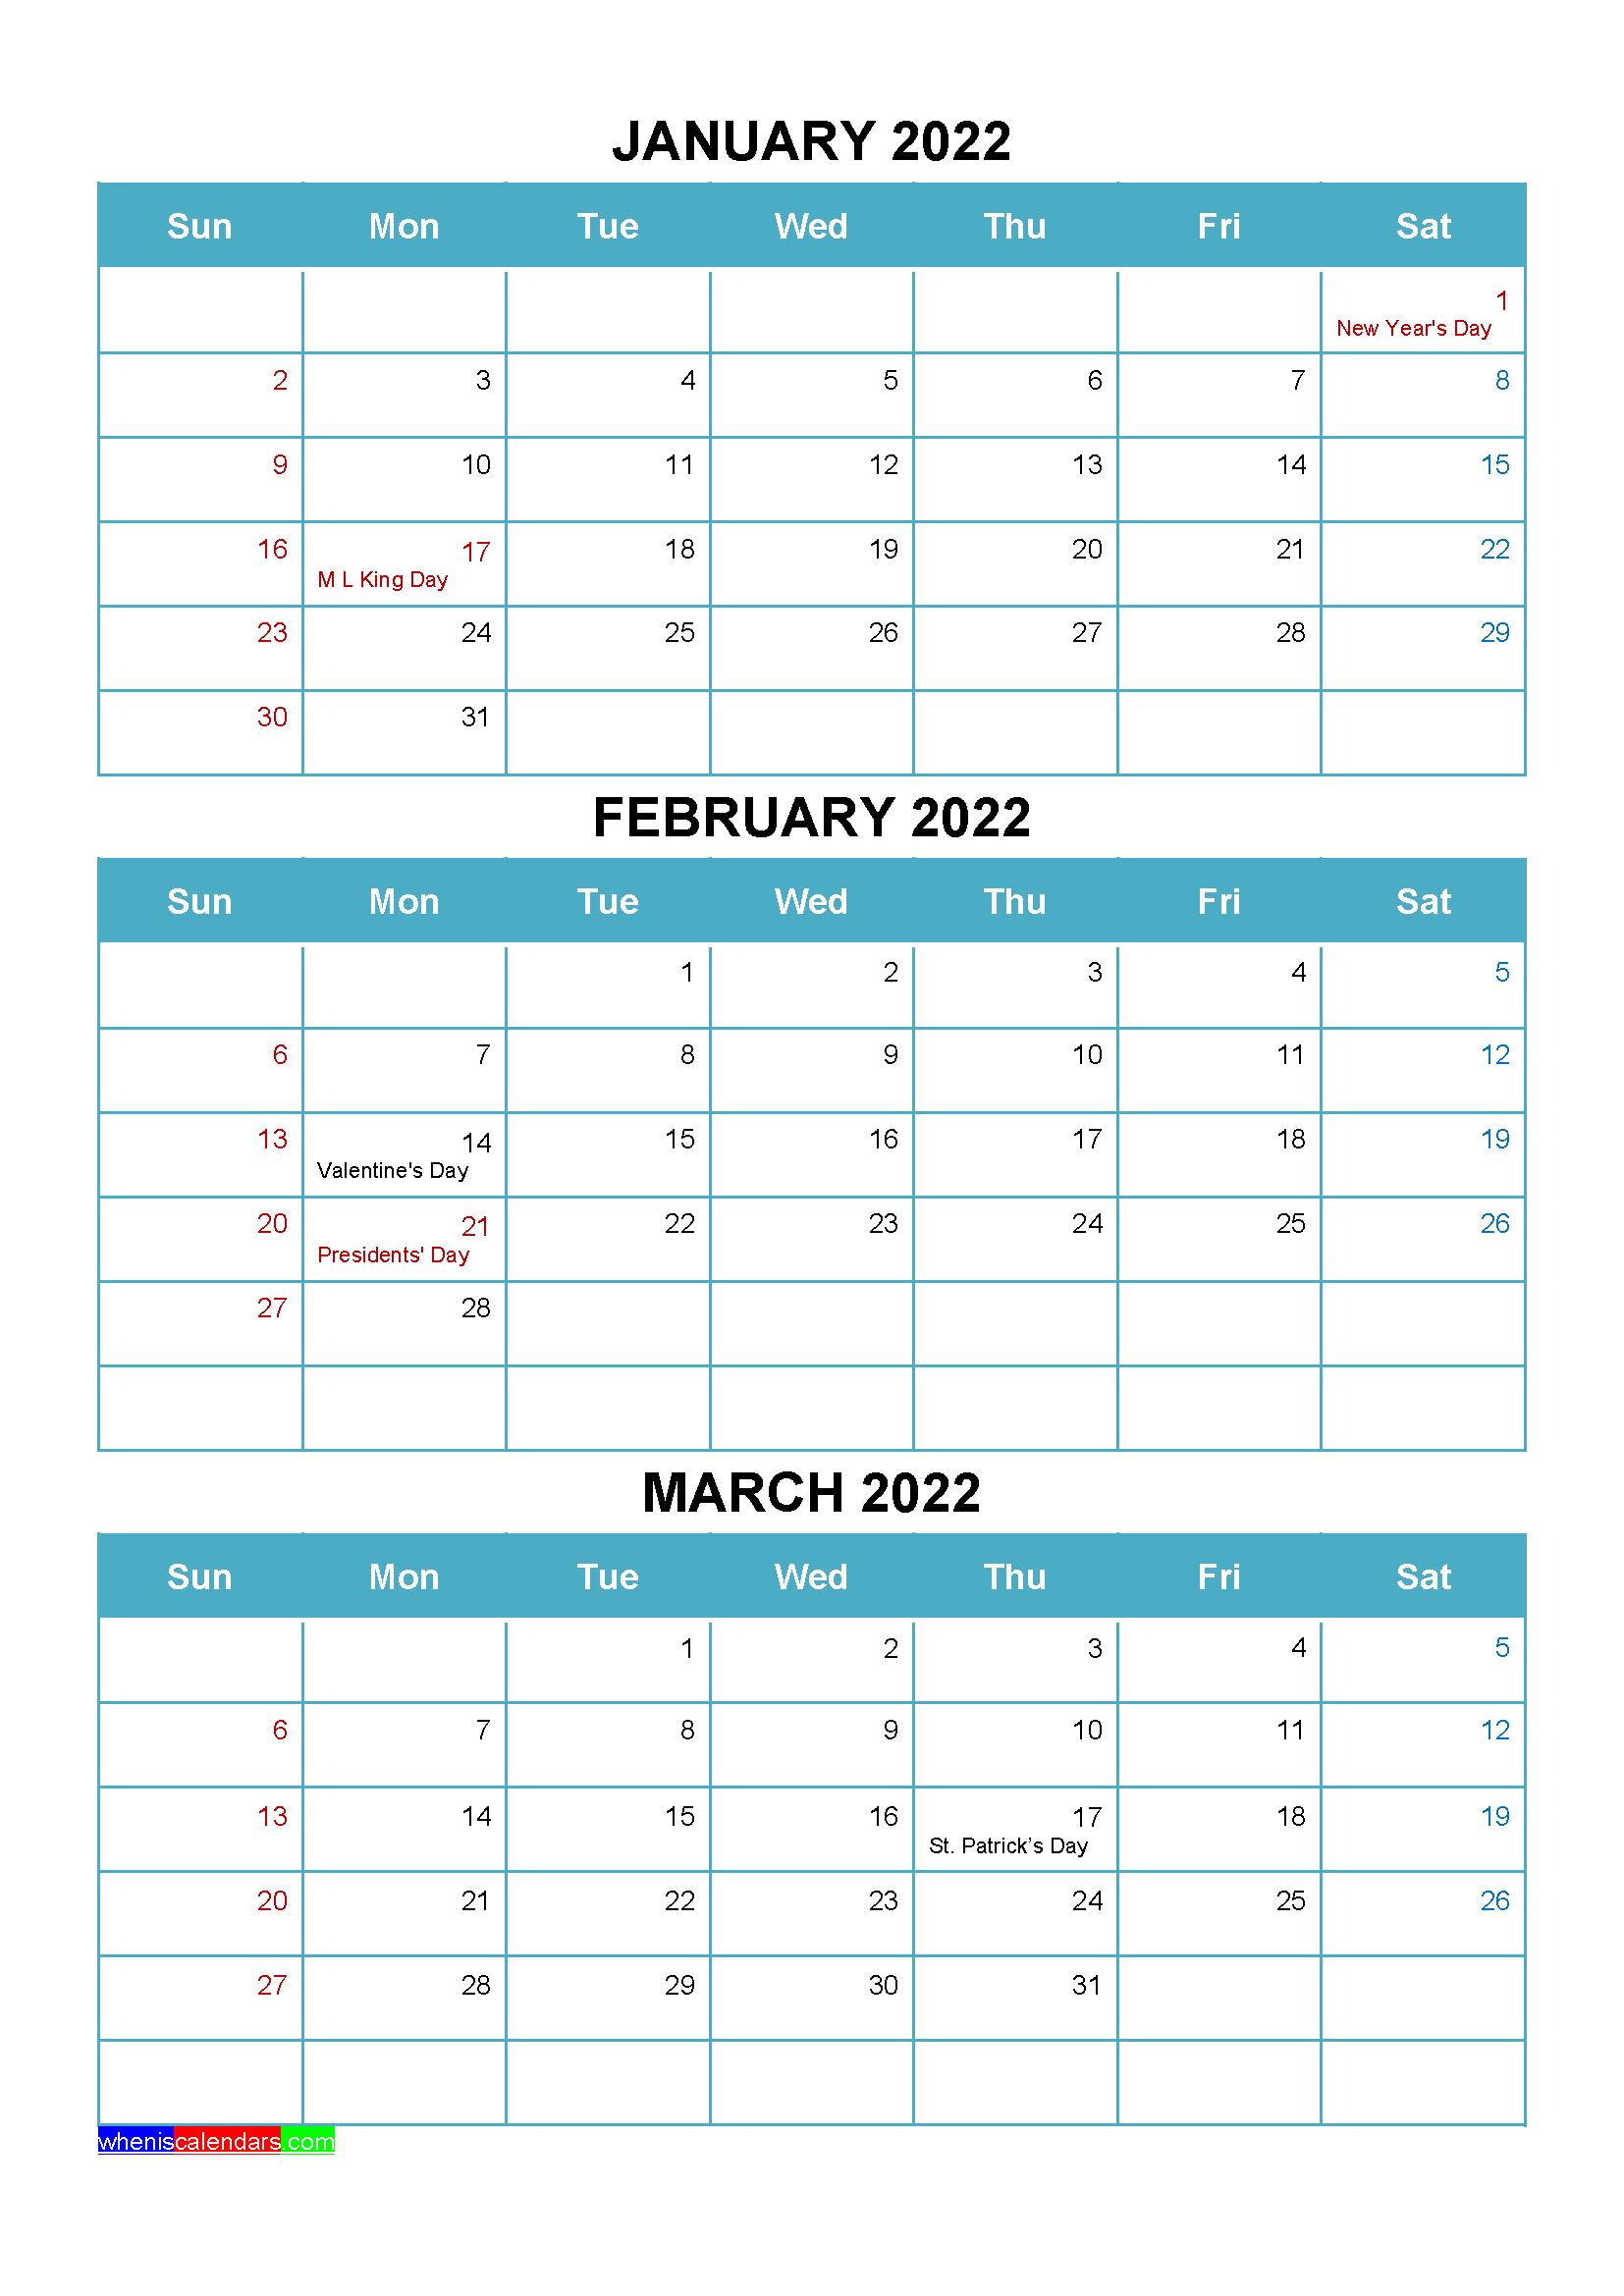 Printable January February March 2022 Calendar with Holidays